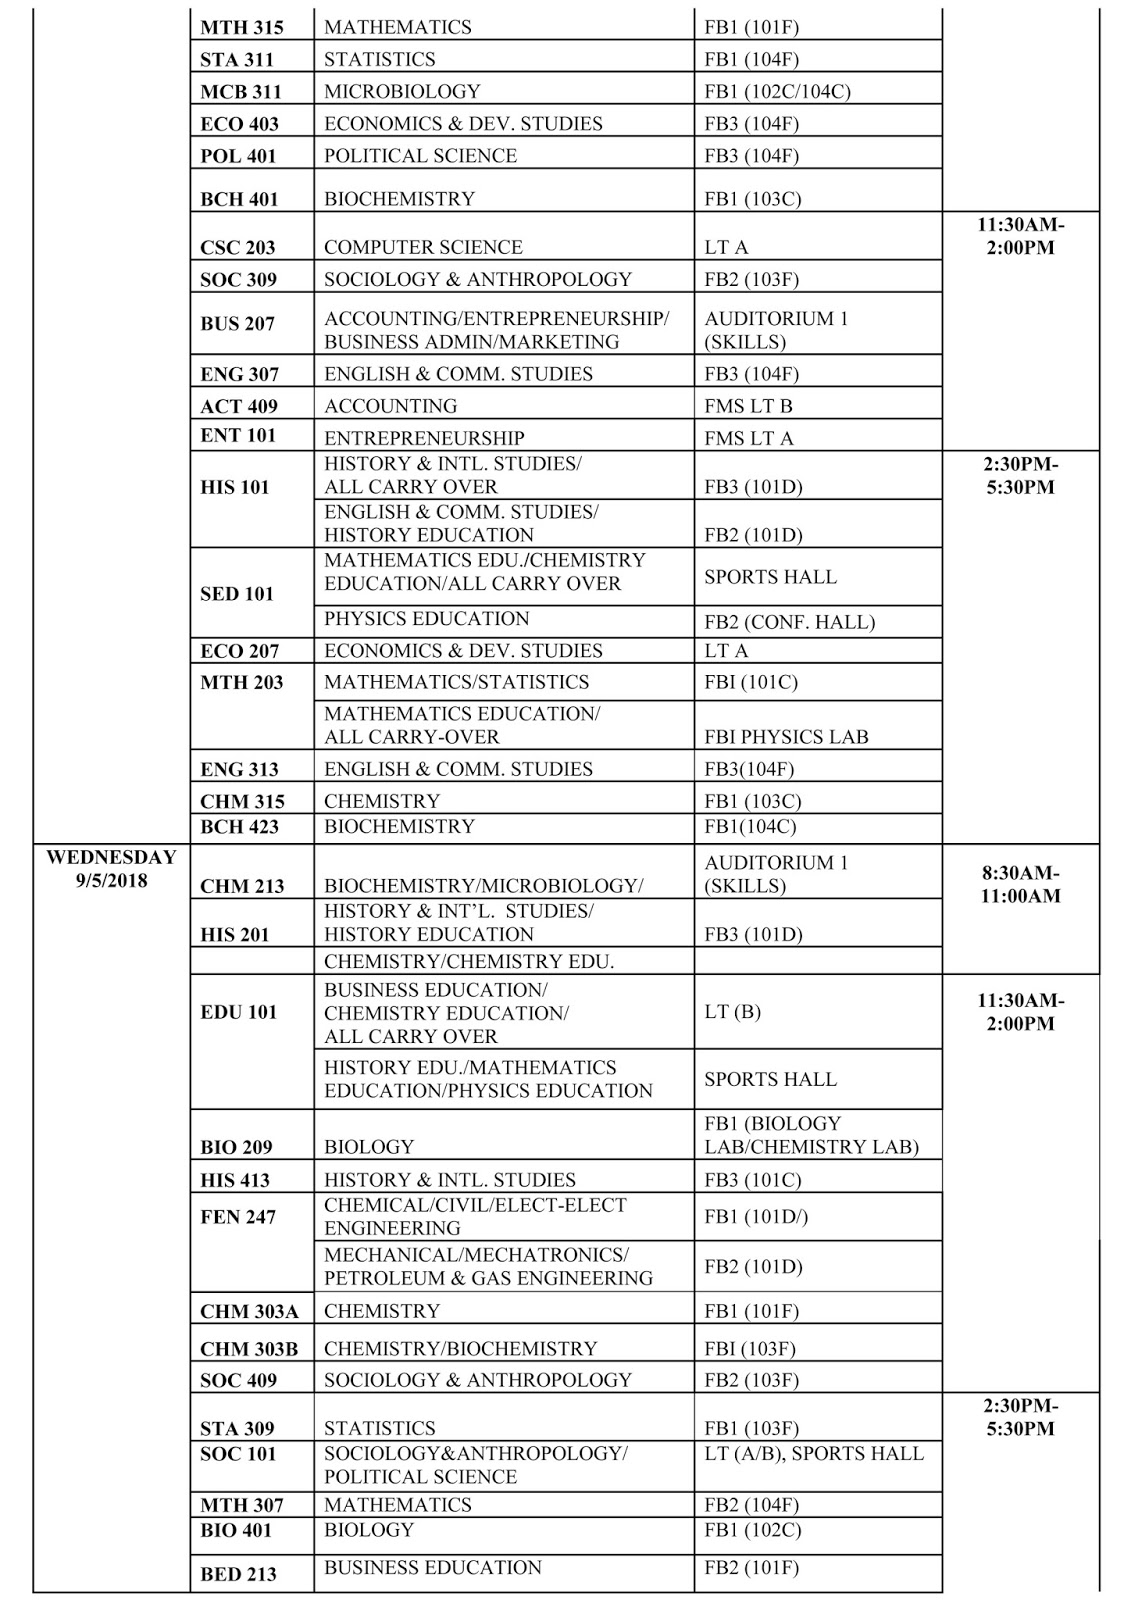 FUOTUOKE Examination Timetable - 1st Semester